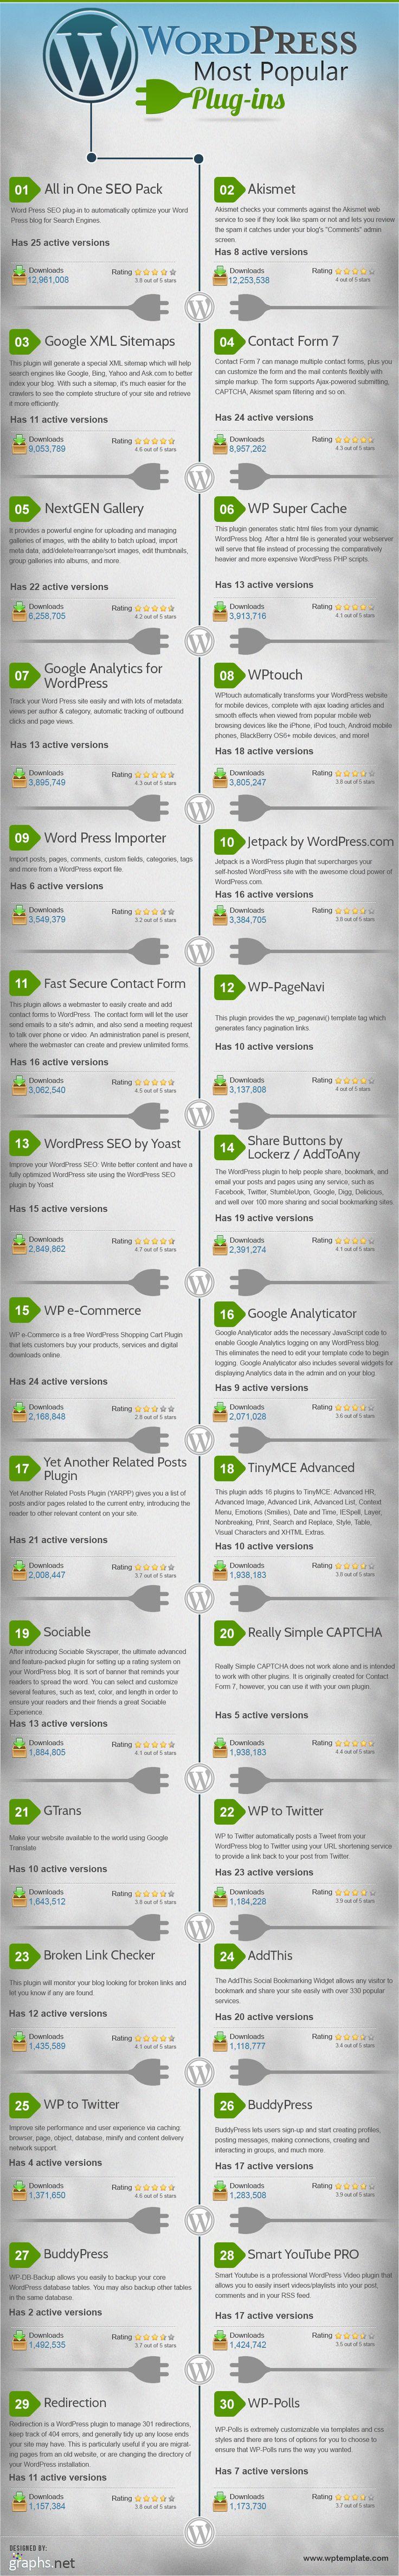 The Most Popular WordPress Plugins | Infographic http://www.intelisystems.com